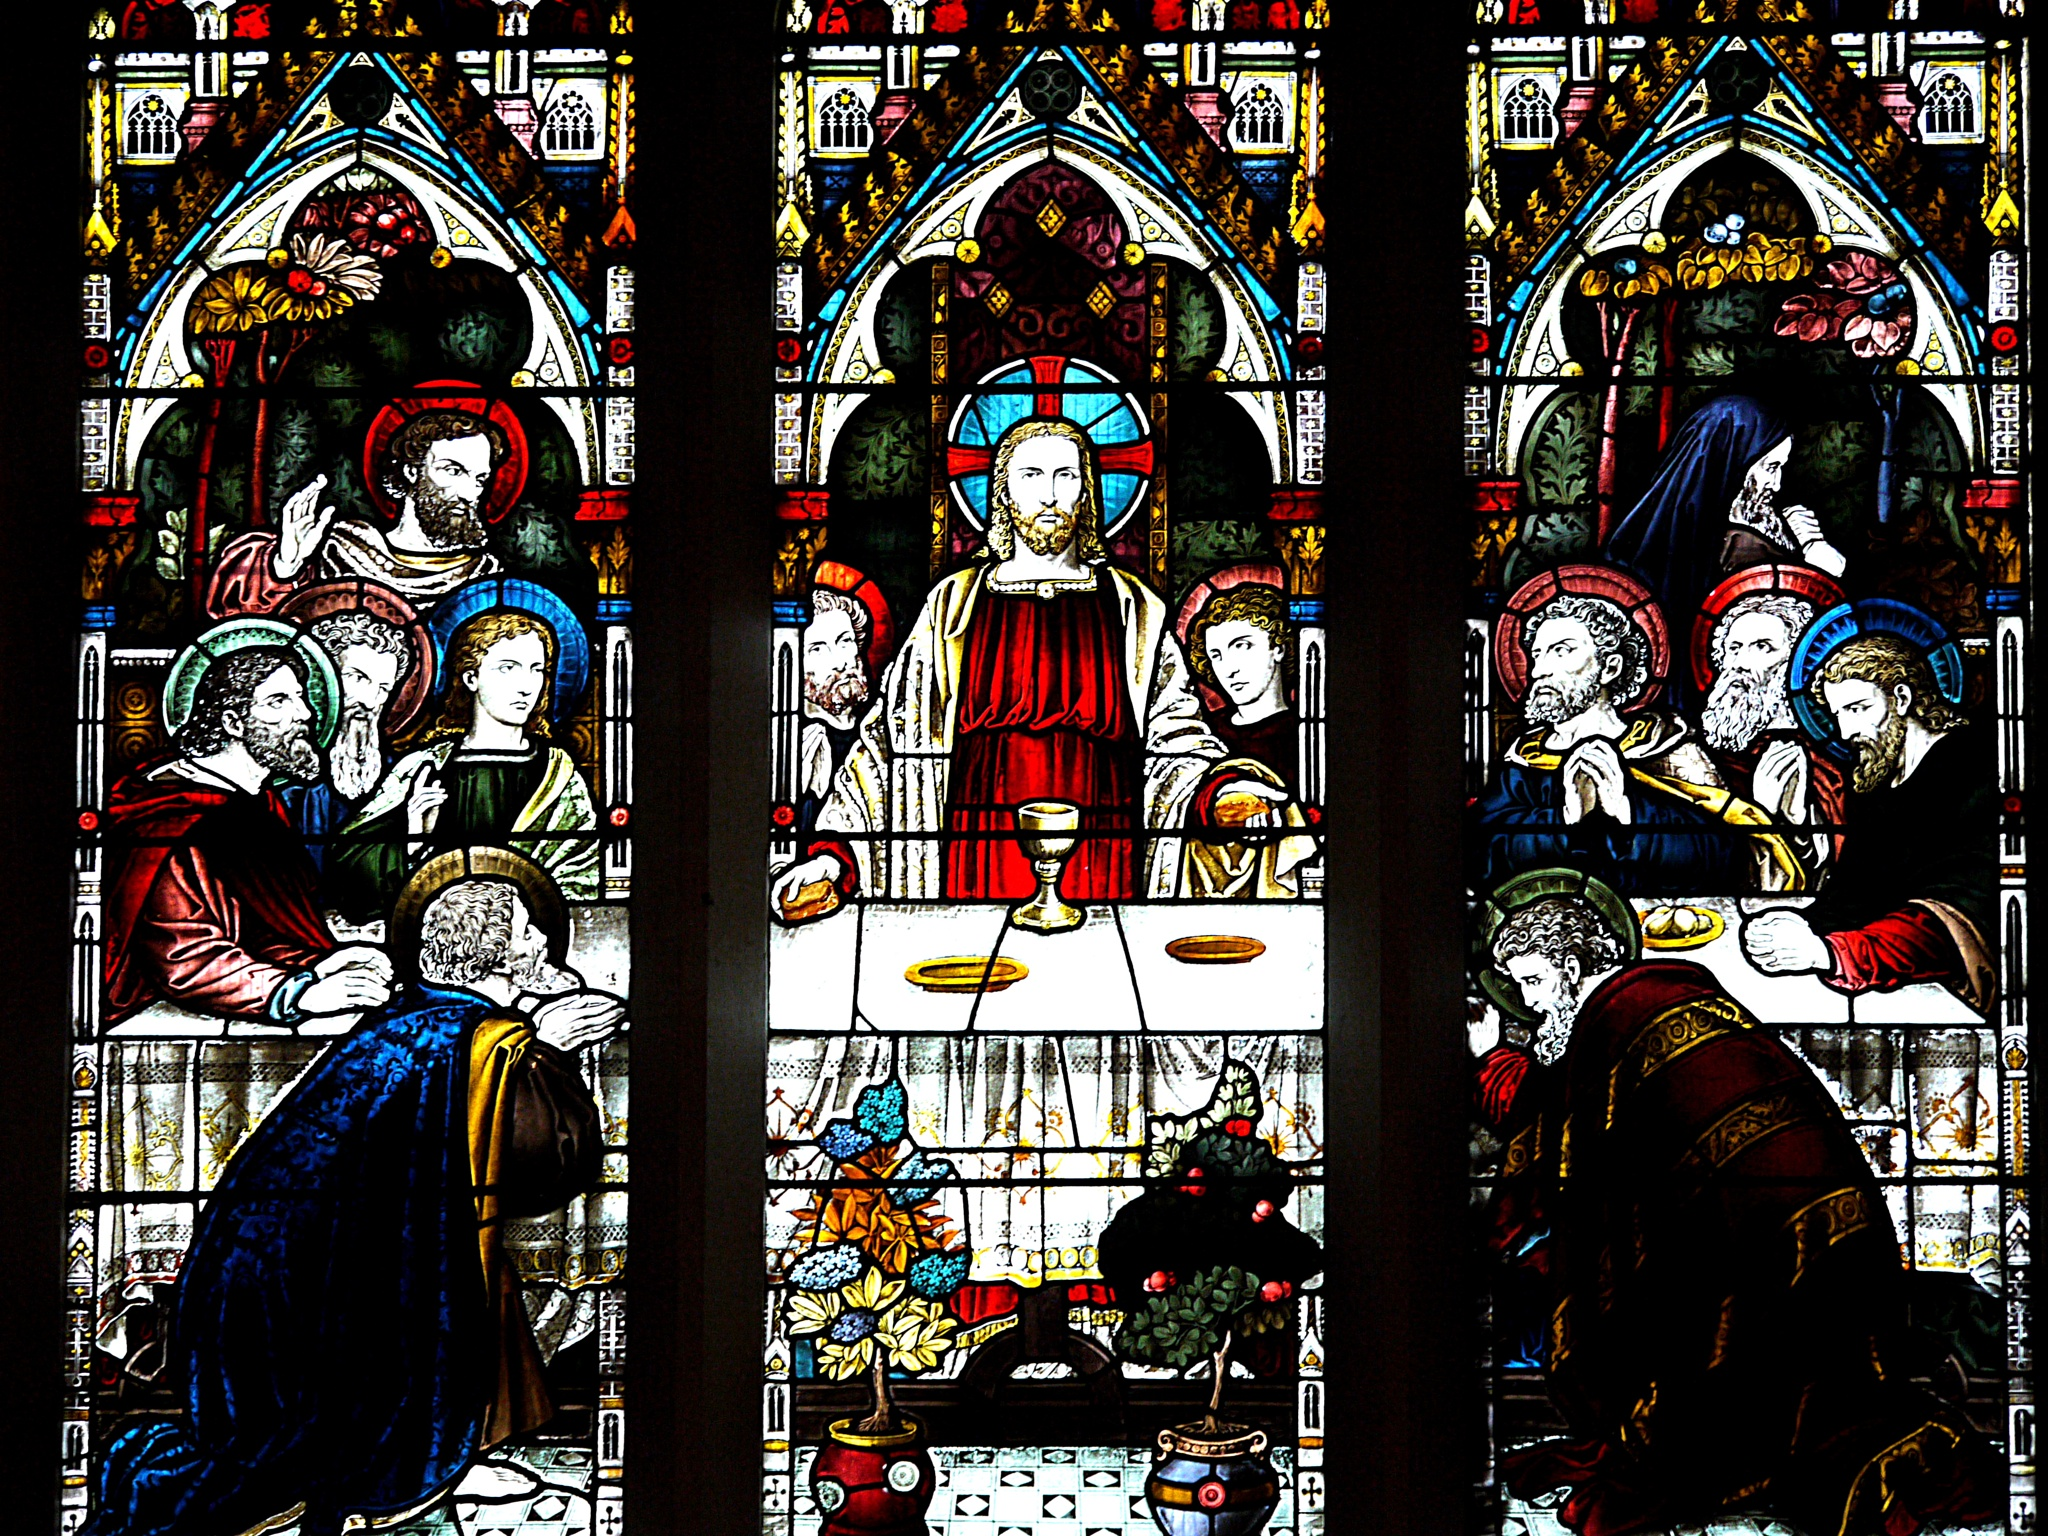 Stained glass window by Derek Hollis